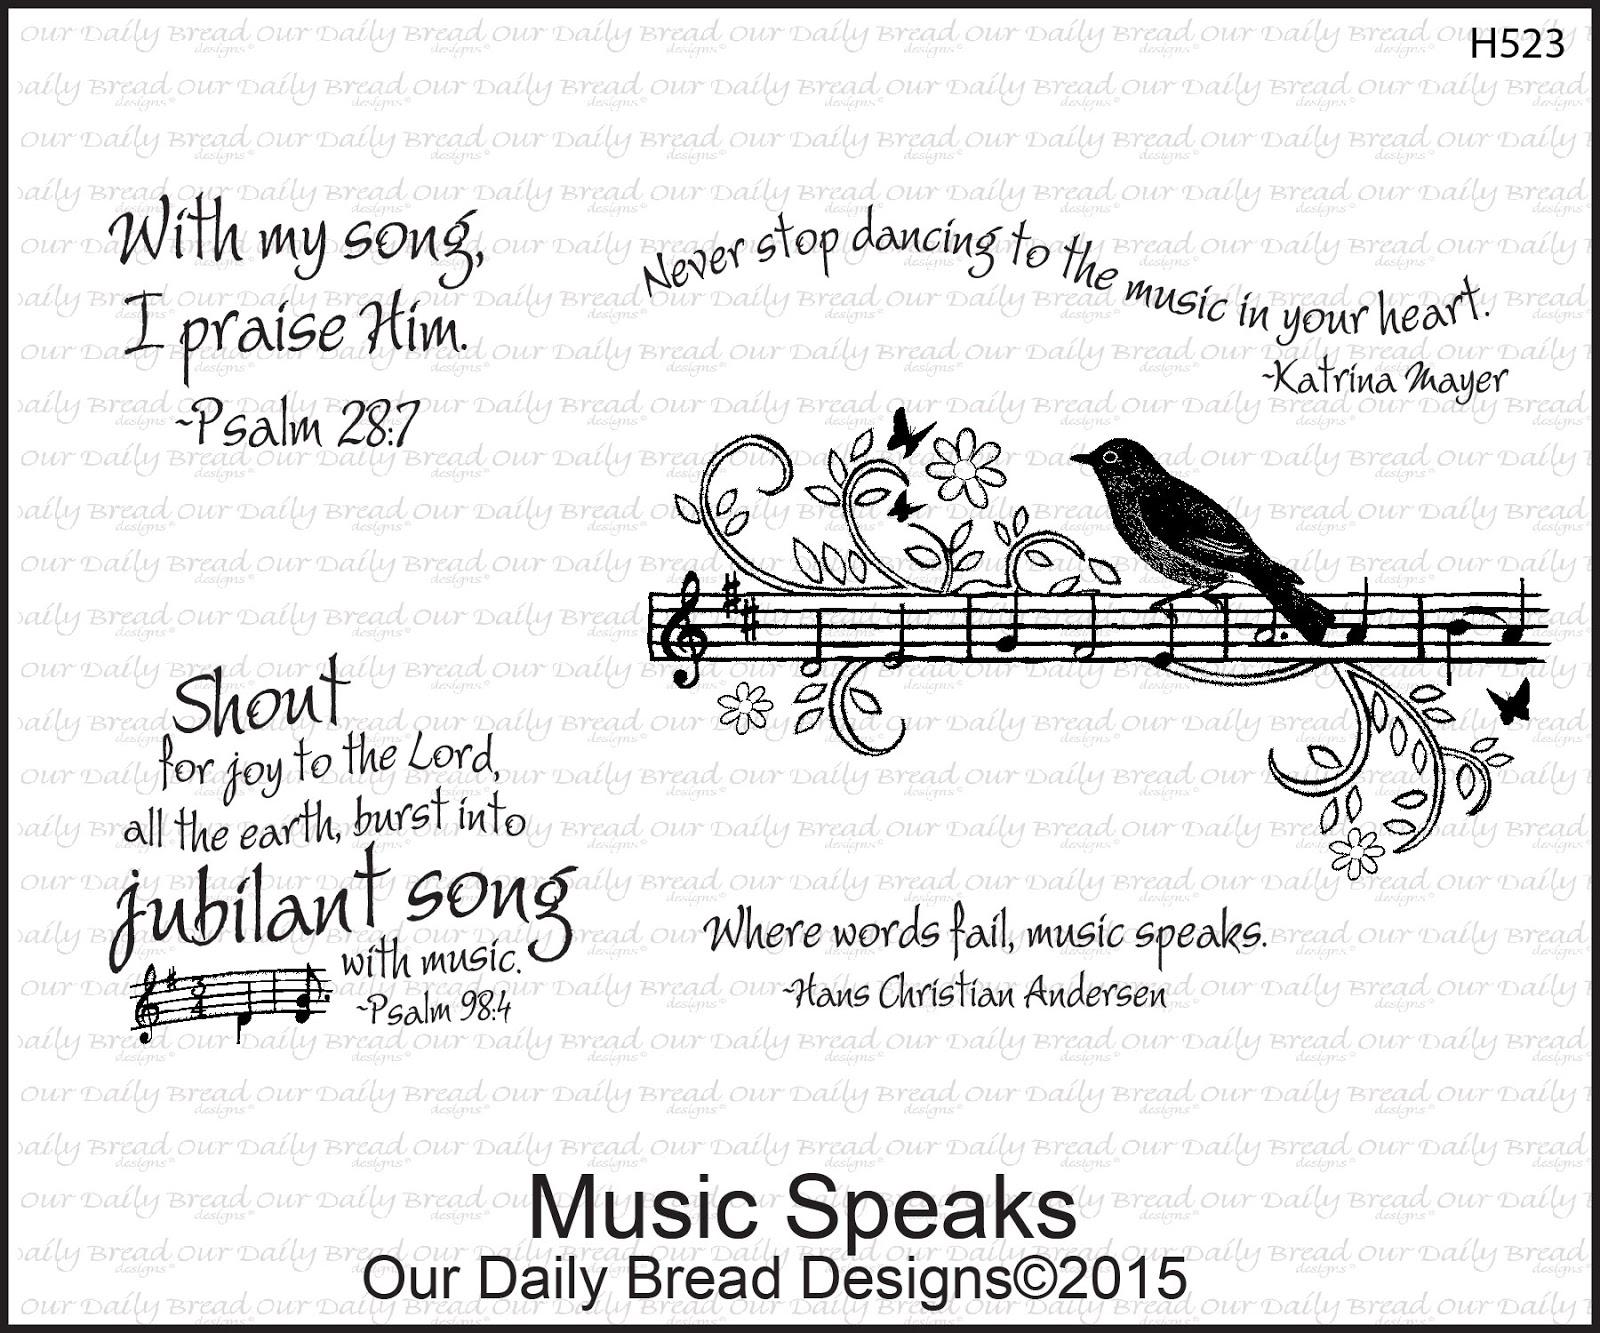 https://www.ourdailybreaddesigns.com/index.php/h523-music-speaks.html